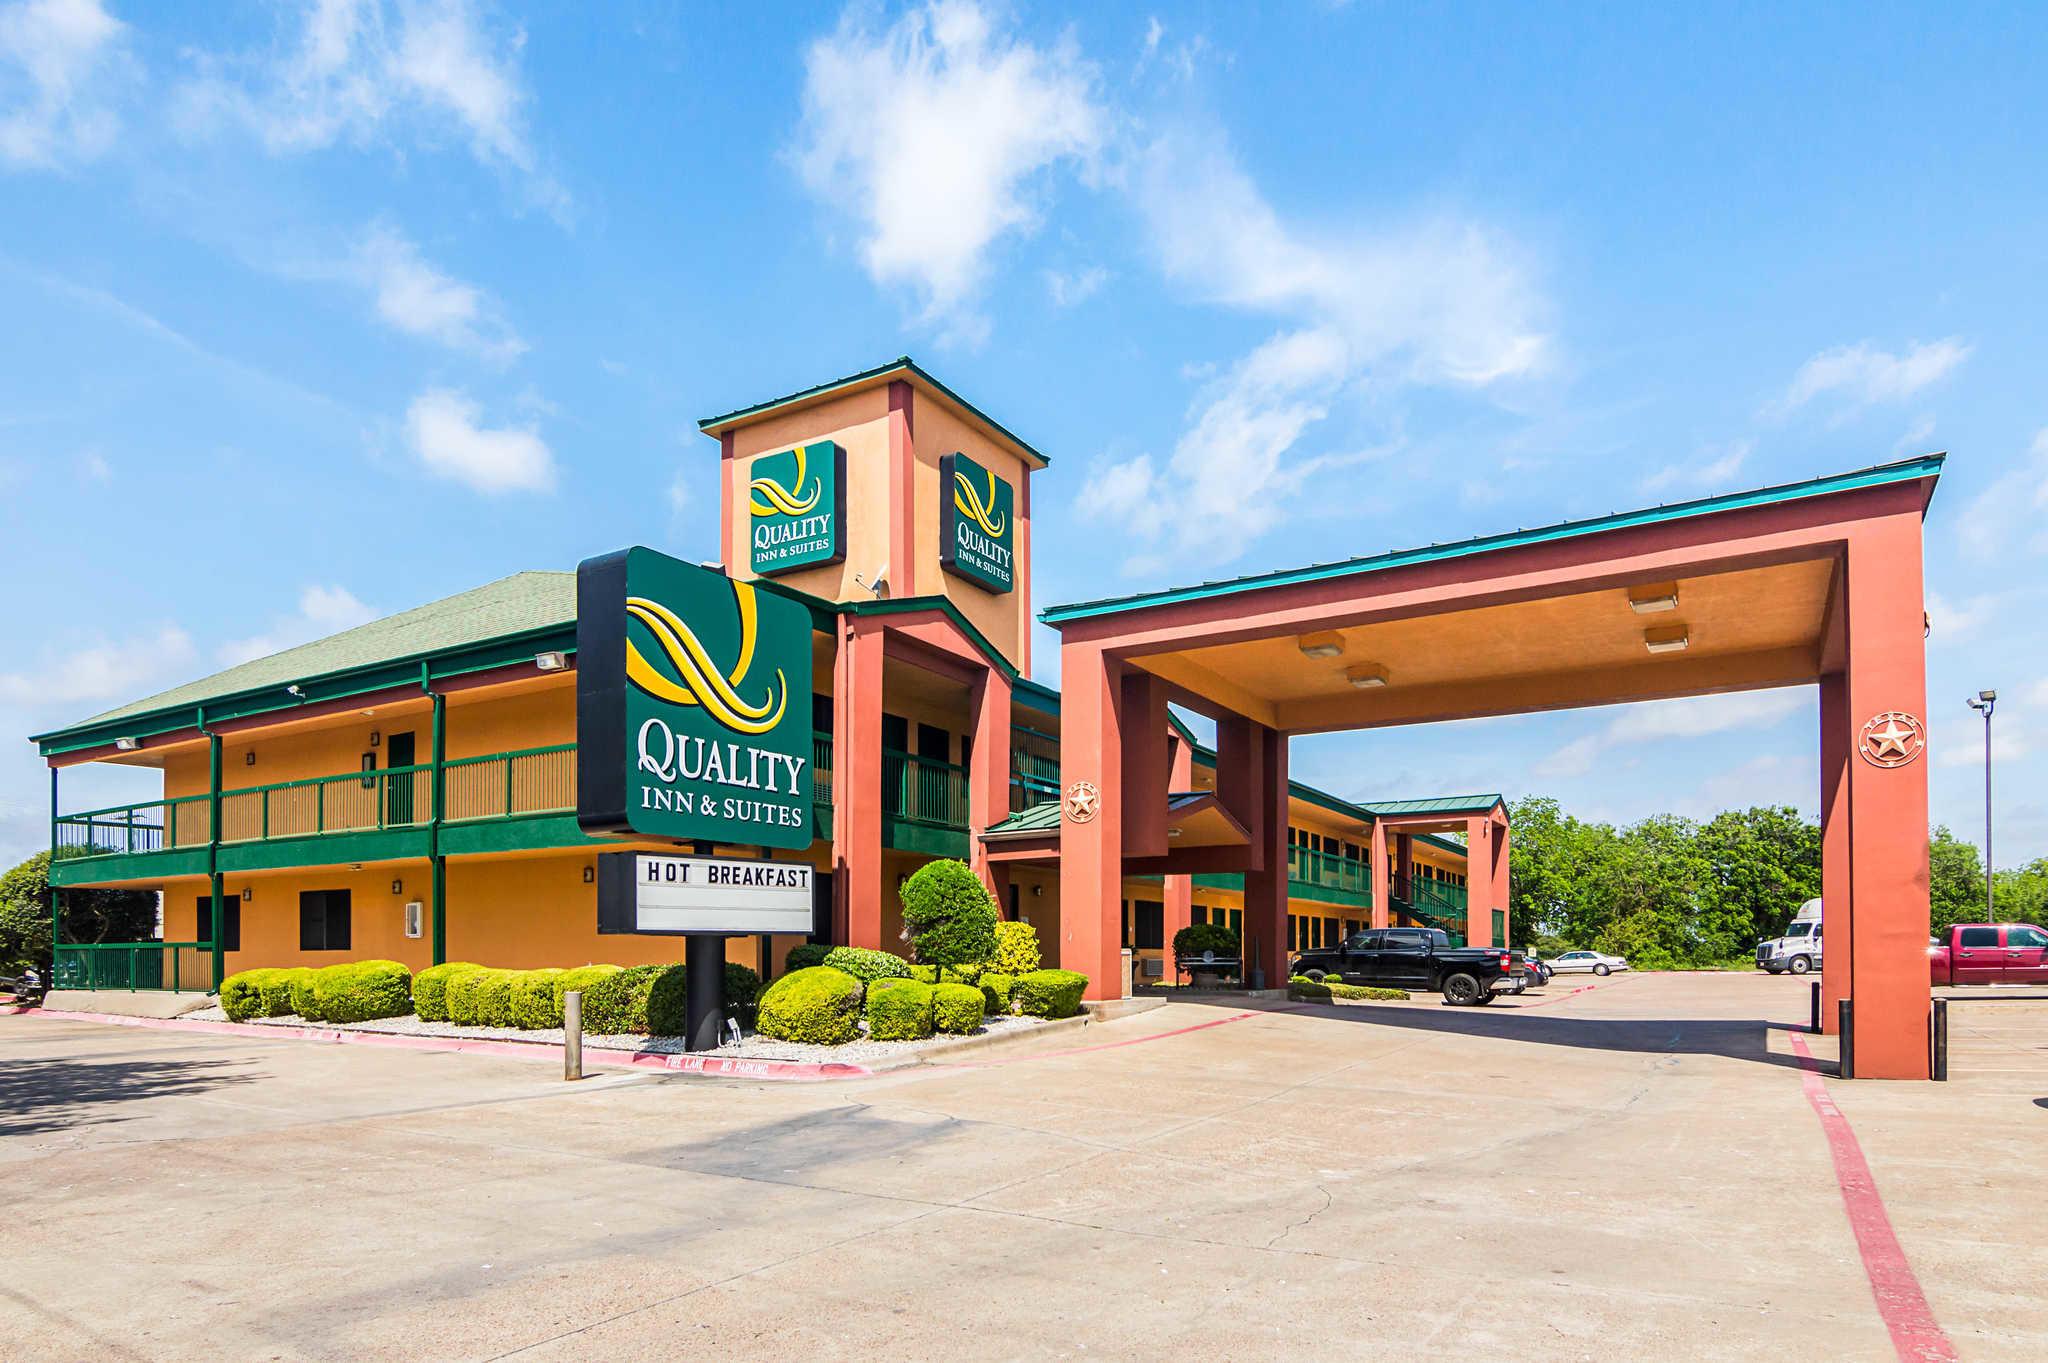 Holiday Inn Hotels Around La